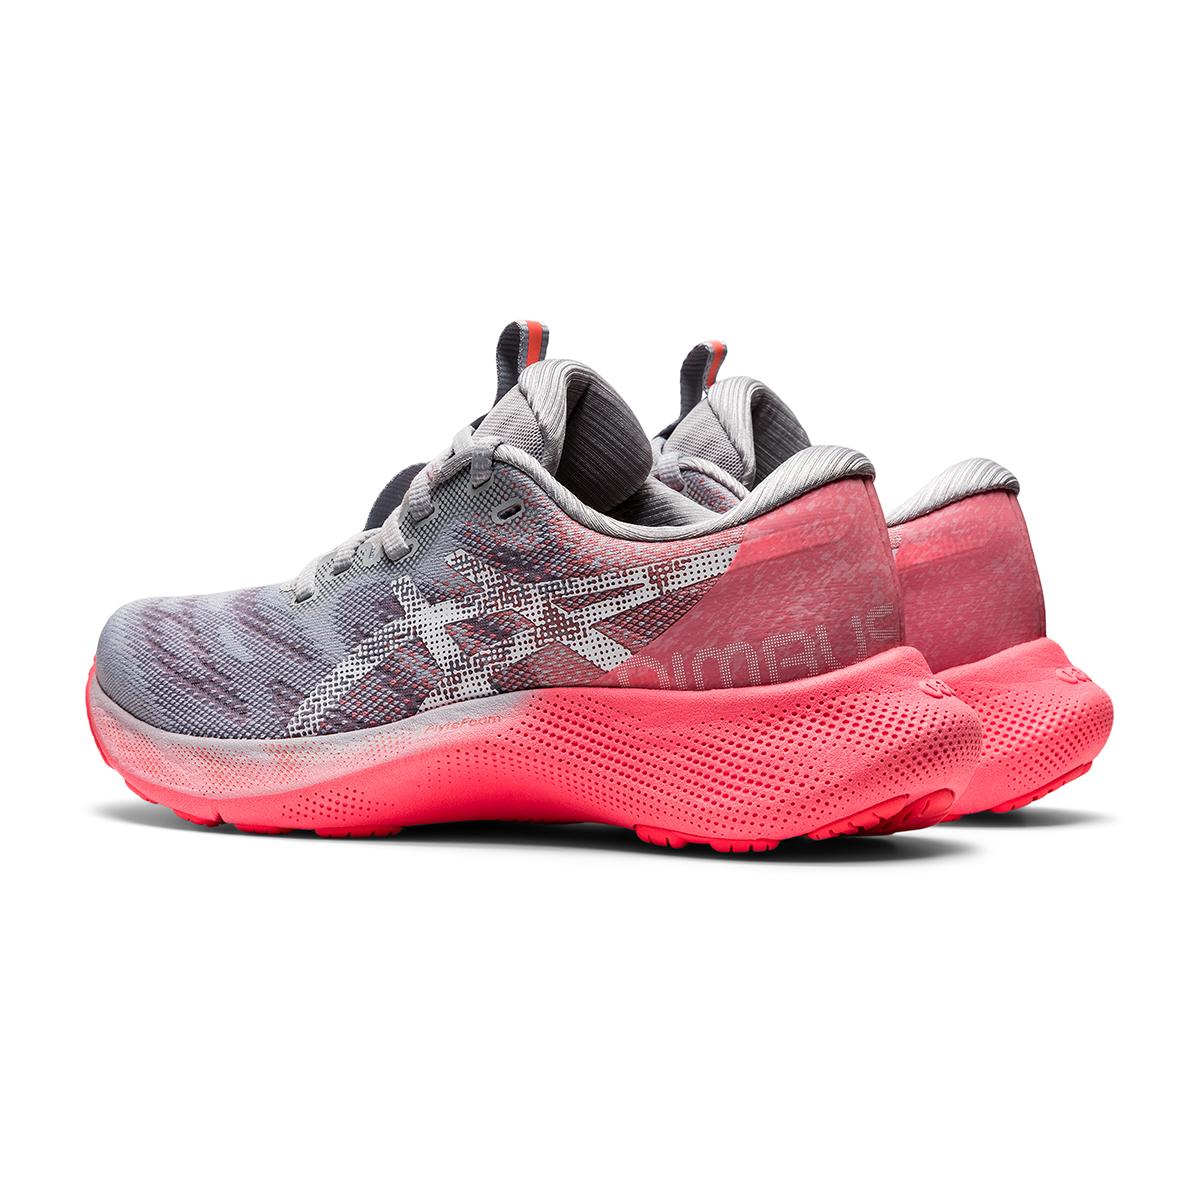 Women's Asics Gel-Nimbus Lite 2 Running Shoe - Color: Blazing Coral  - Size: 5 - Width: Regular, Blazing Coral, large, image 4